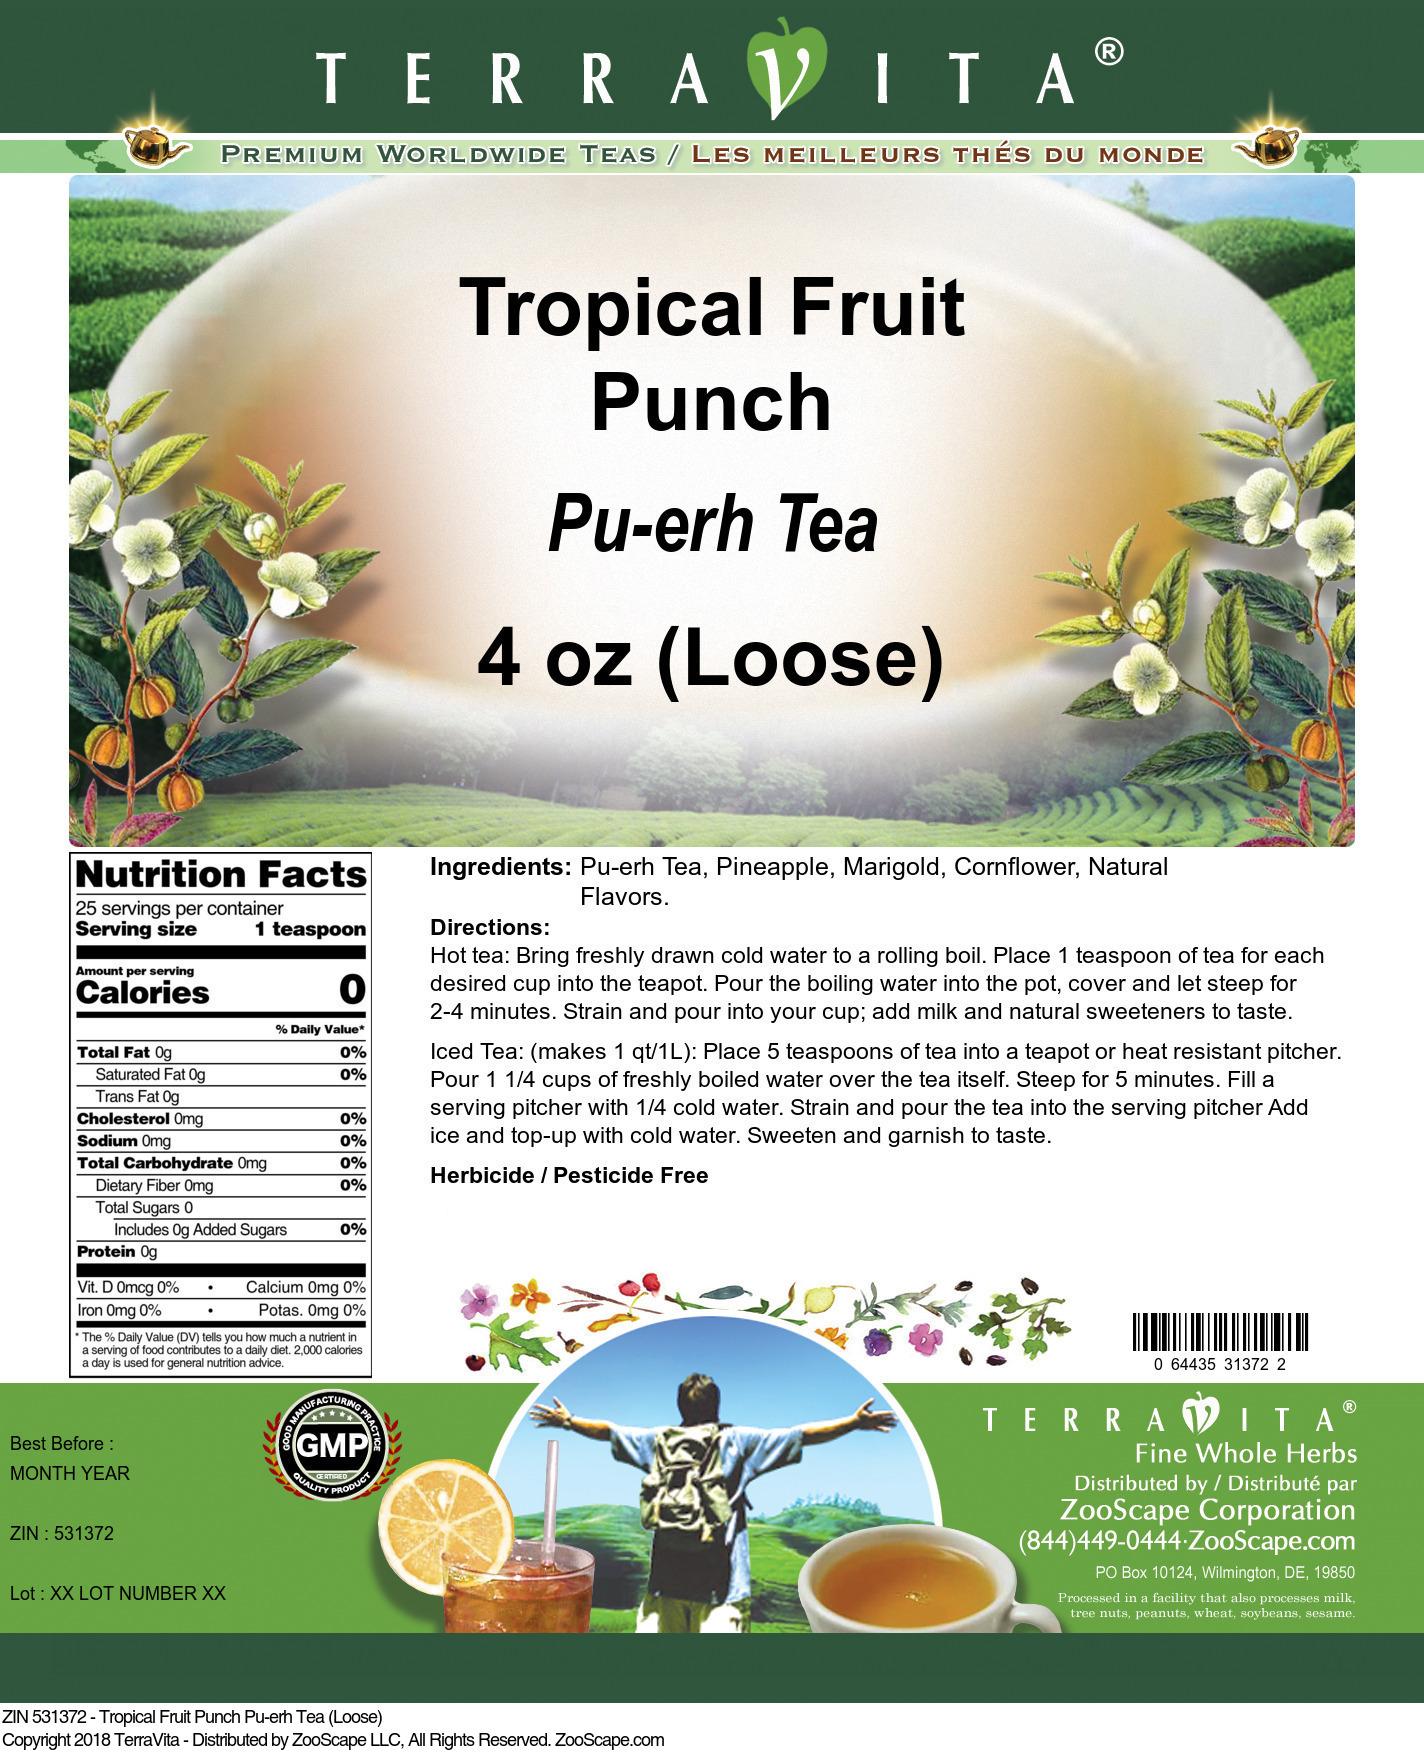 Tropical Fruit Punch Pu-erh Tea (Loose)